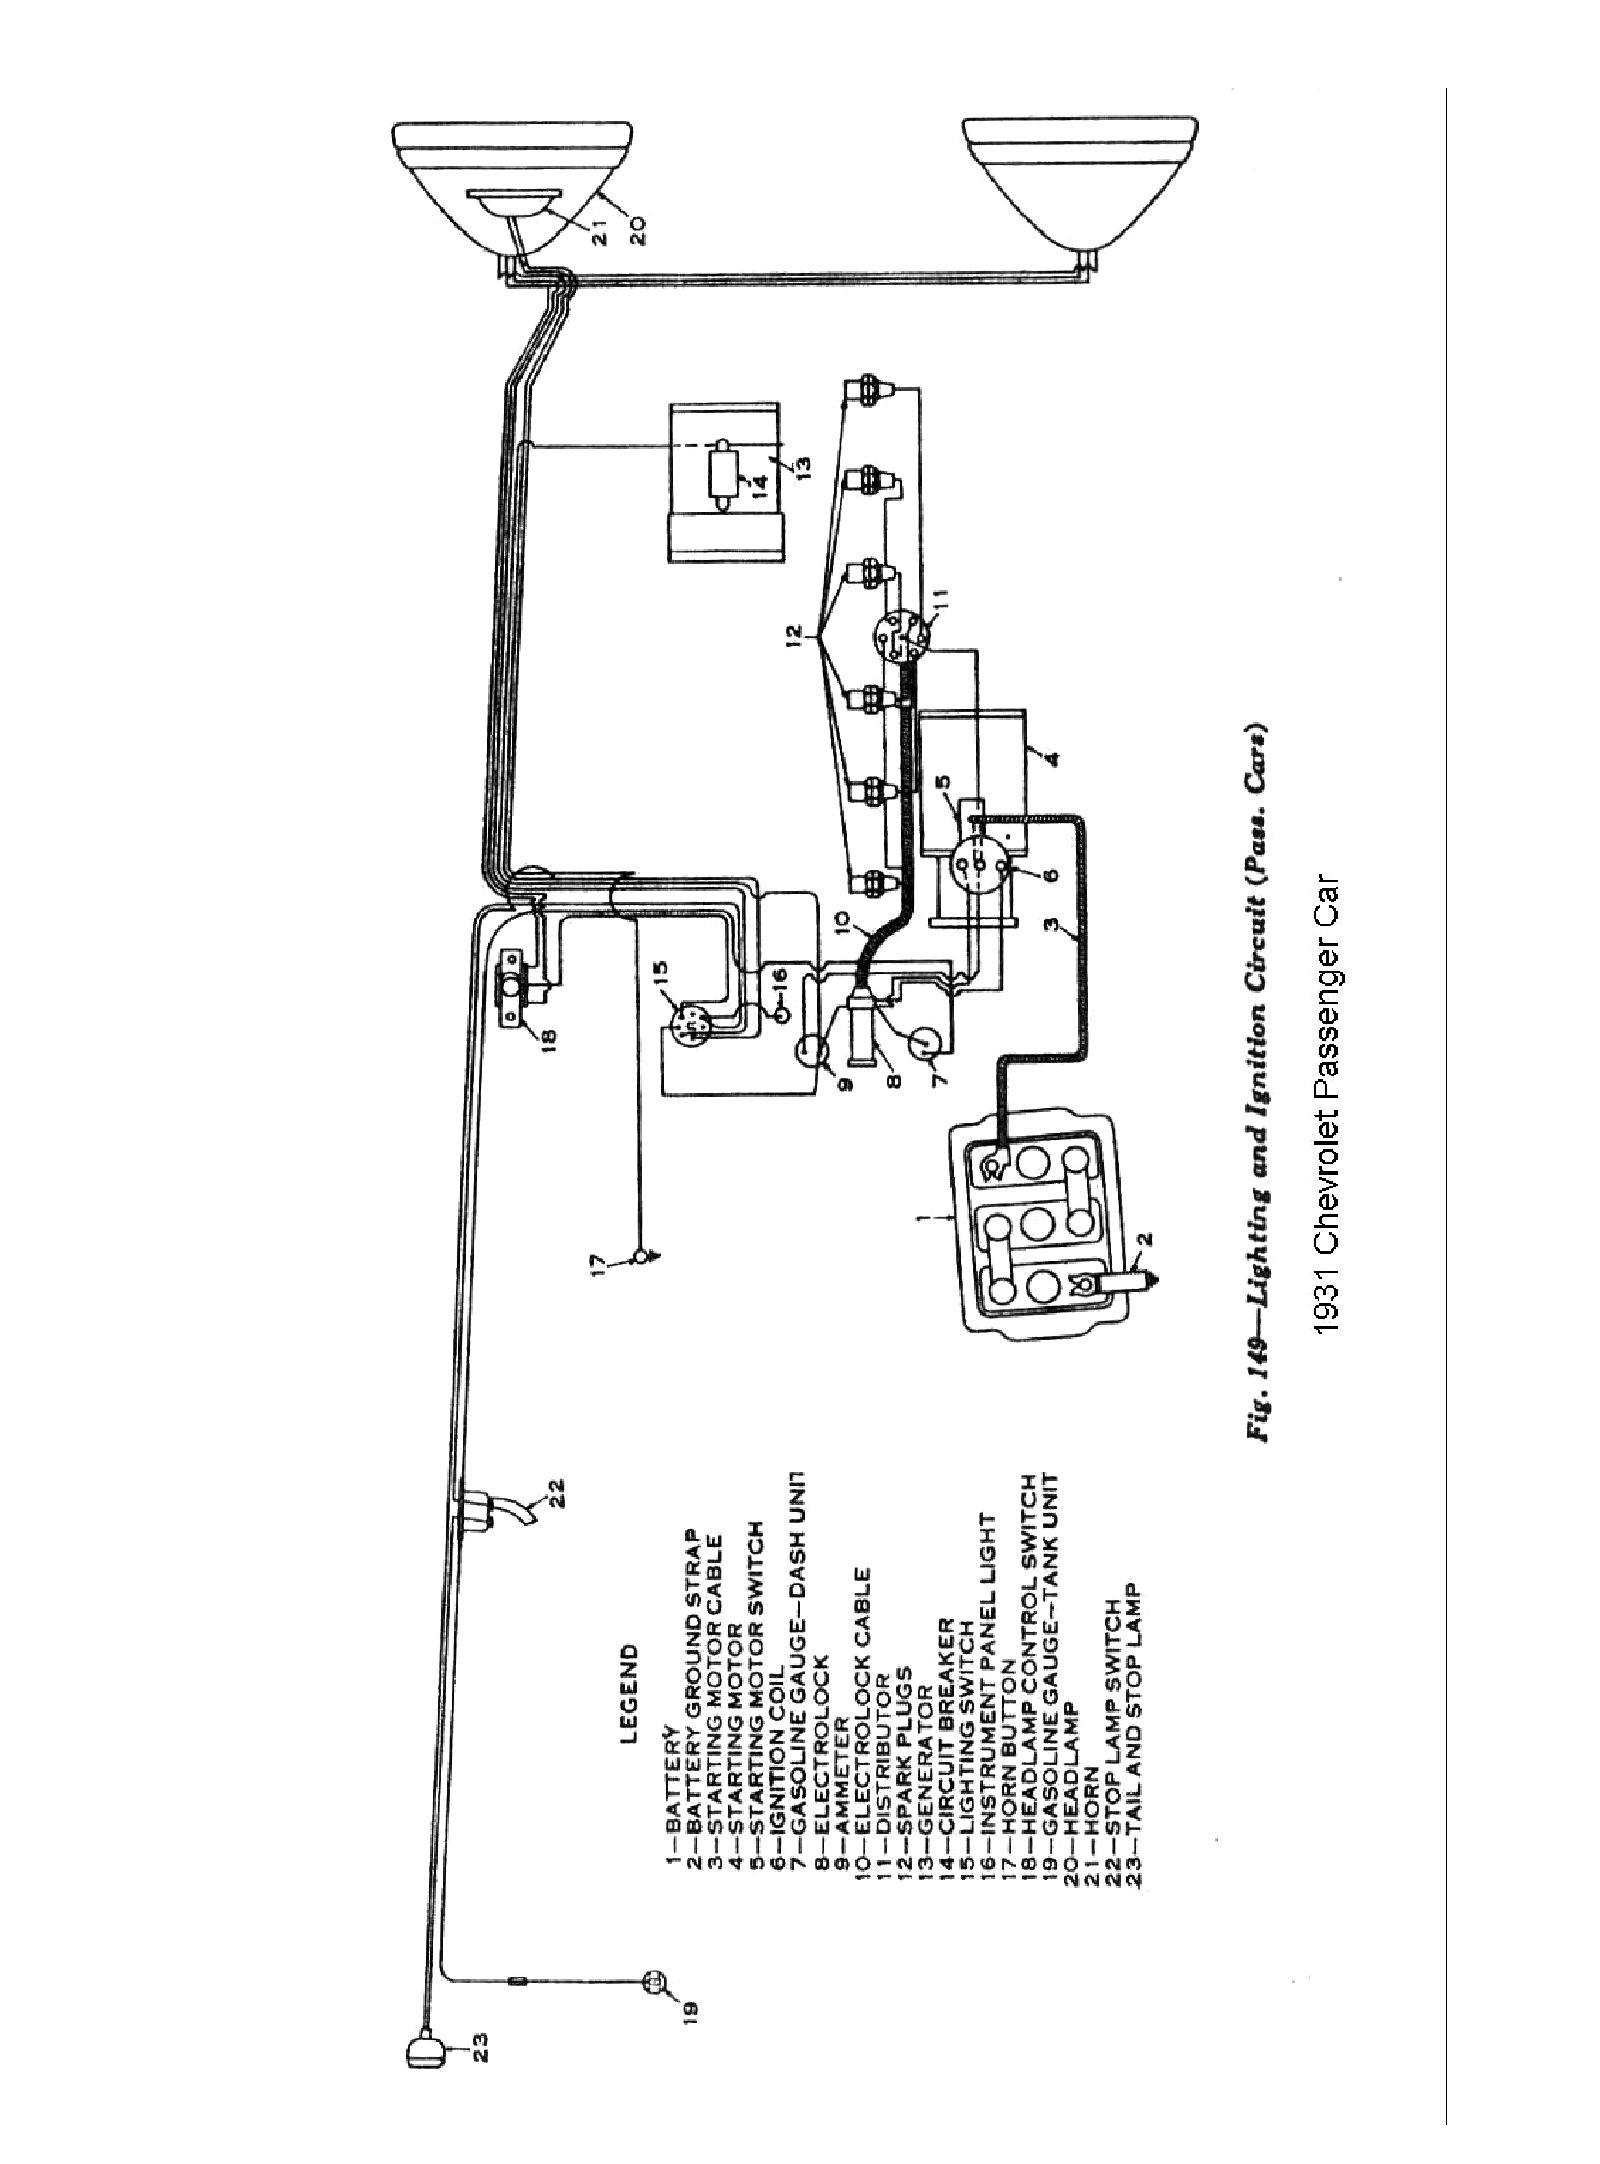 Diagrams Lx172 Wiring Stx46 Diagram F932. Buick Navigation Wiring Diagram Liry On Stx46 F932 John Deere. John Deere. F932 John Deere Lawn Mower Electrical Diagram At Scoala.co